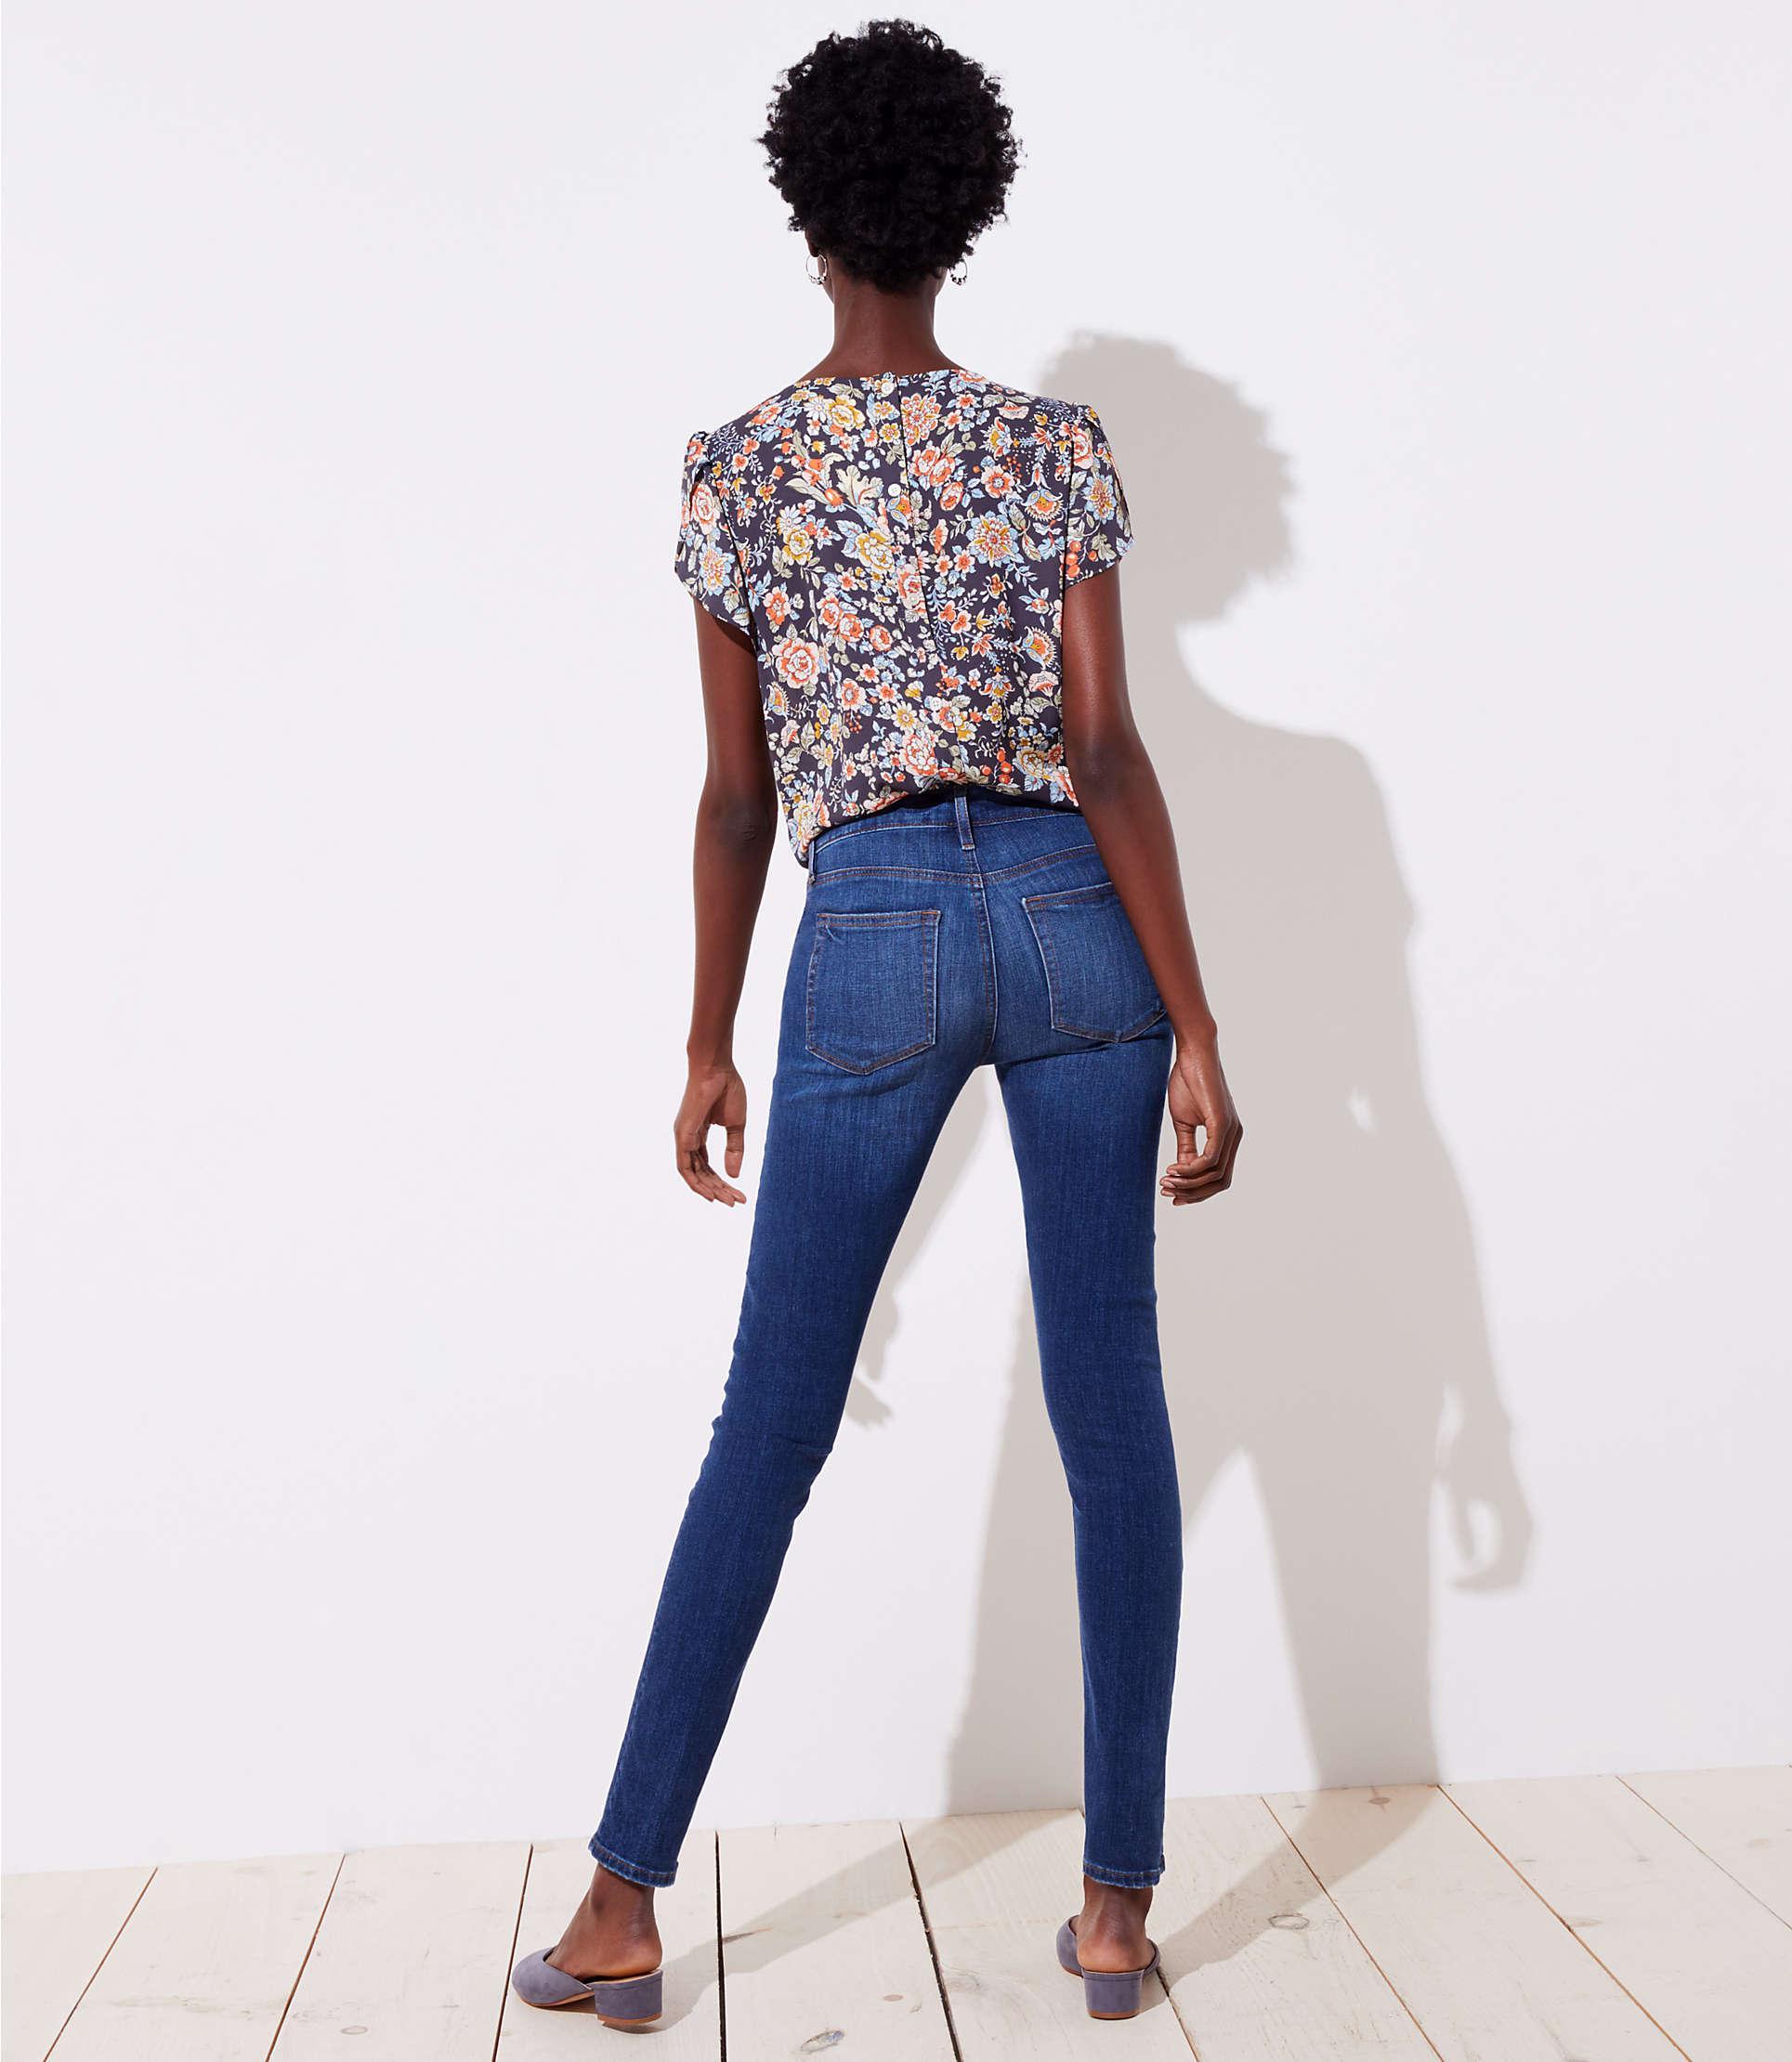 d7282ee8c2044 LOFT - Blue Tall Modern Destructed Slim Pocket Skinny Jeans In Mid Indigo  Wash - Lyst. View fullscreen